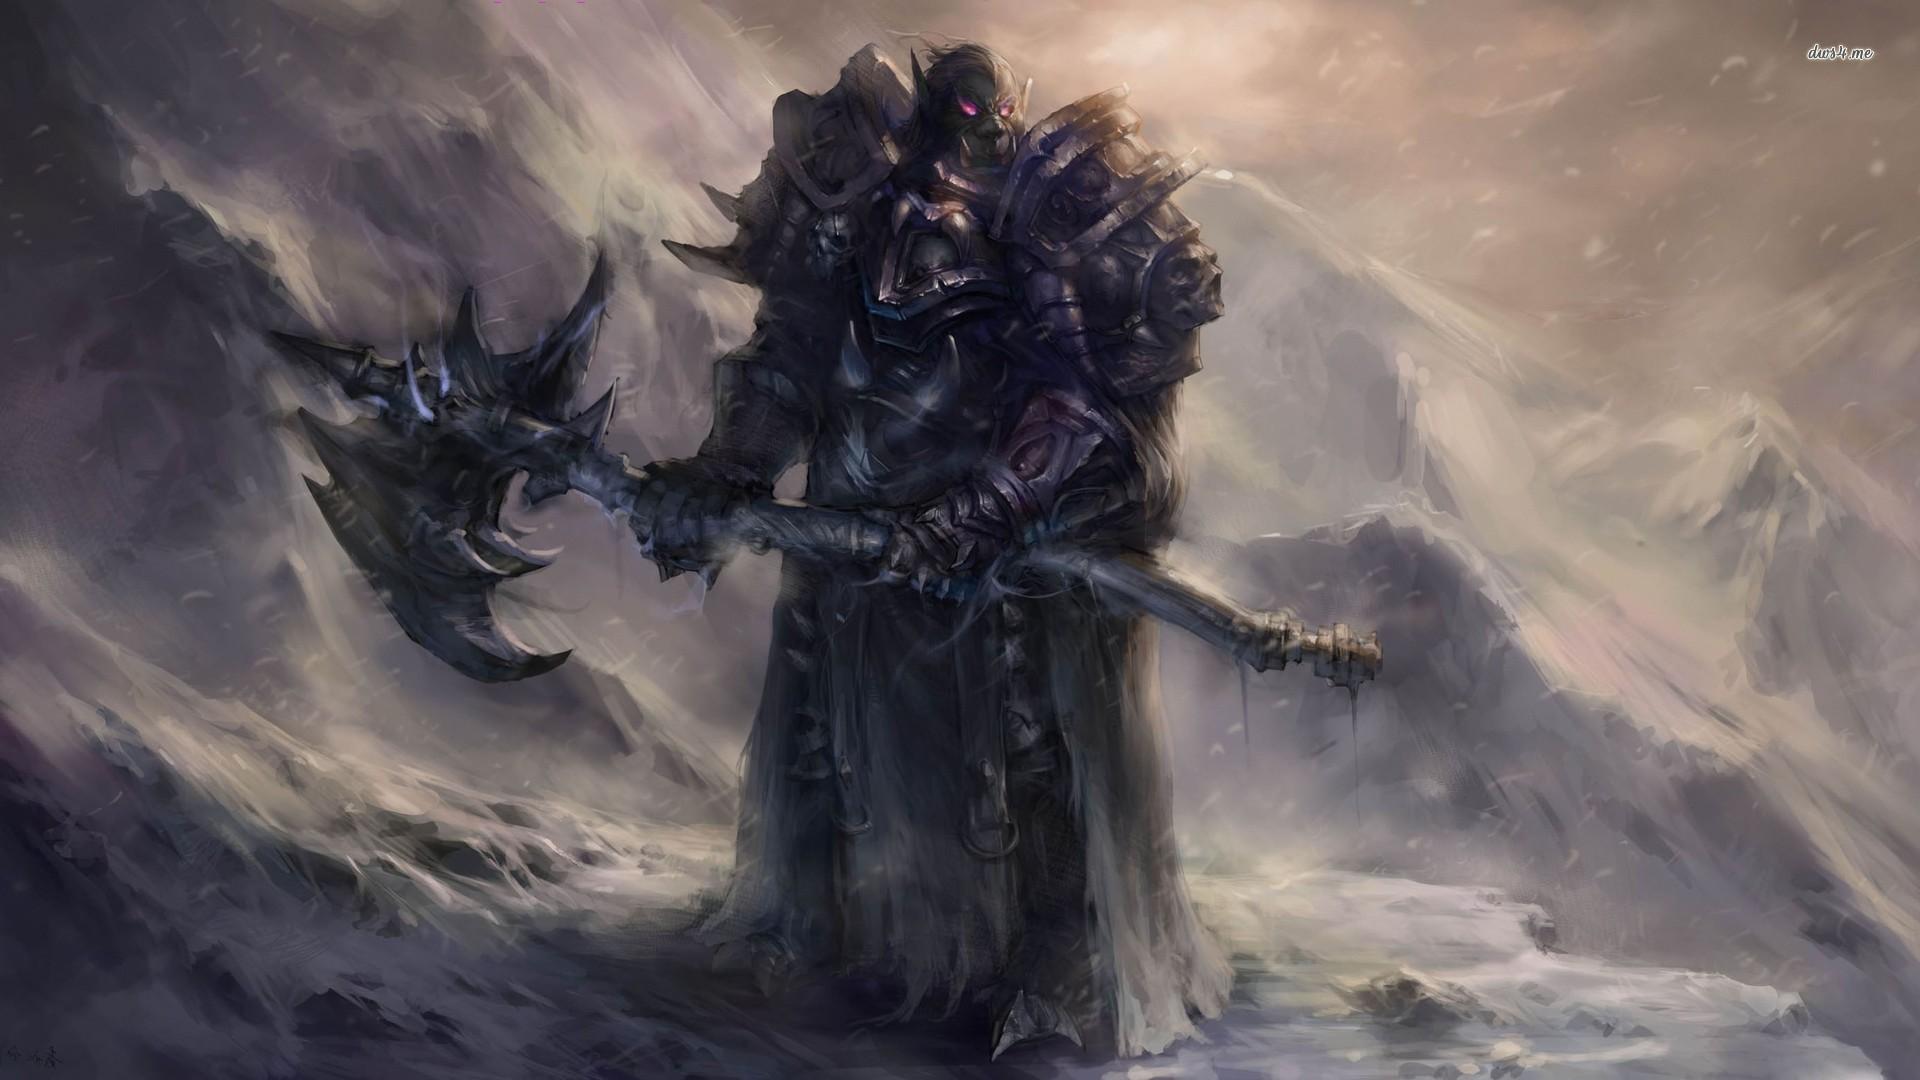 World Of Warcraft The Dark Portal Uhd 4k Wallpaper: Orc Death Knight Wallpaper (73+ Images